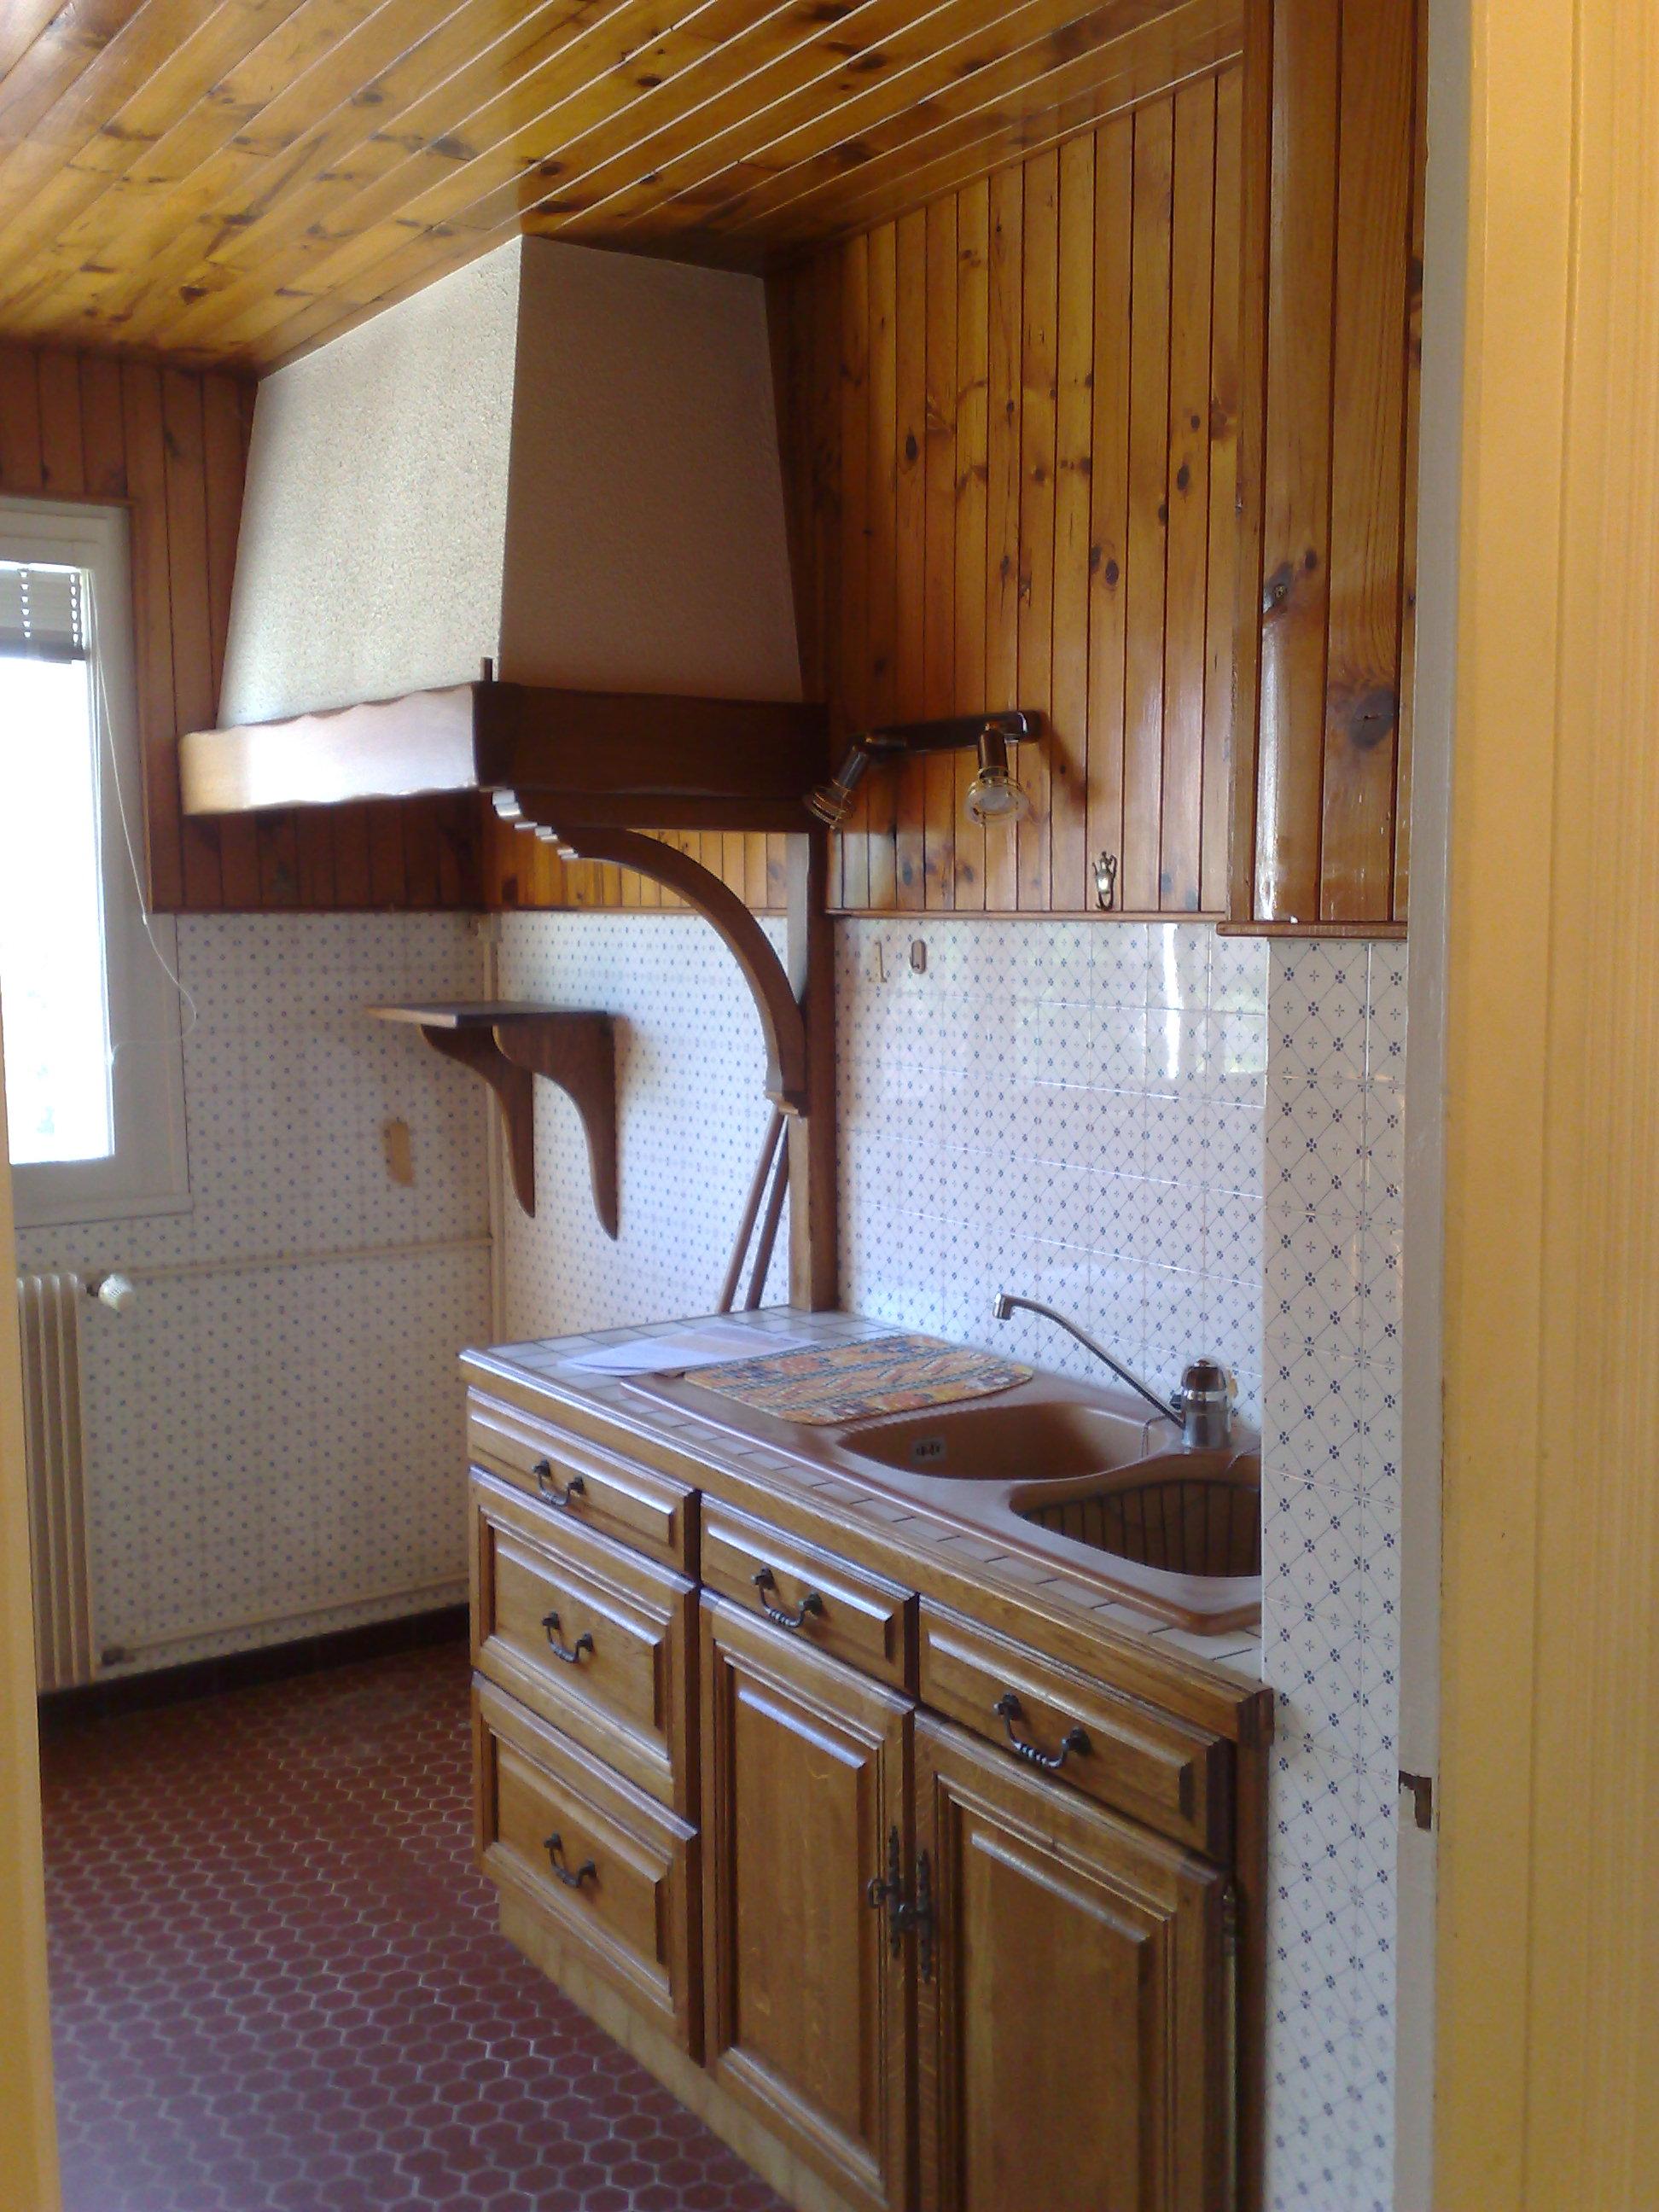 cr ation d une cuisine dijon centre 21 2 design. Black Bedroom Furniture Sets. Home Design Ideas